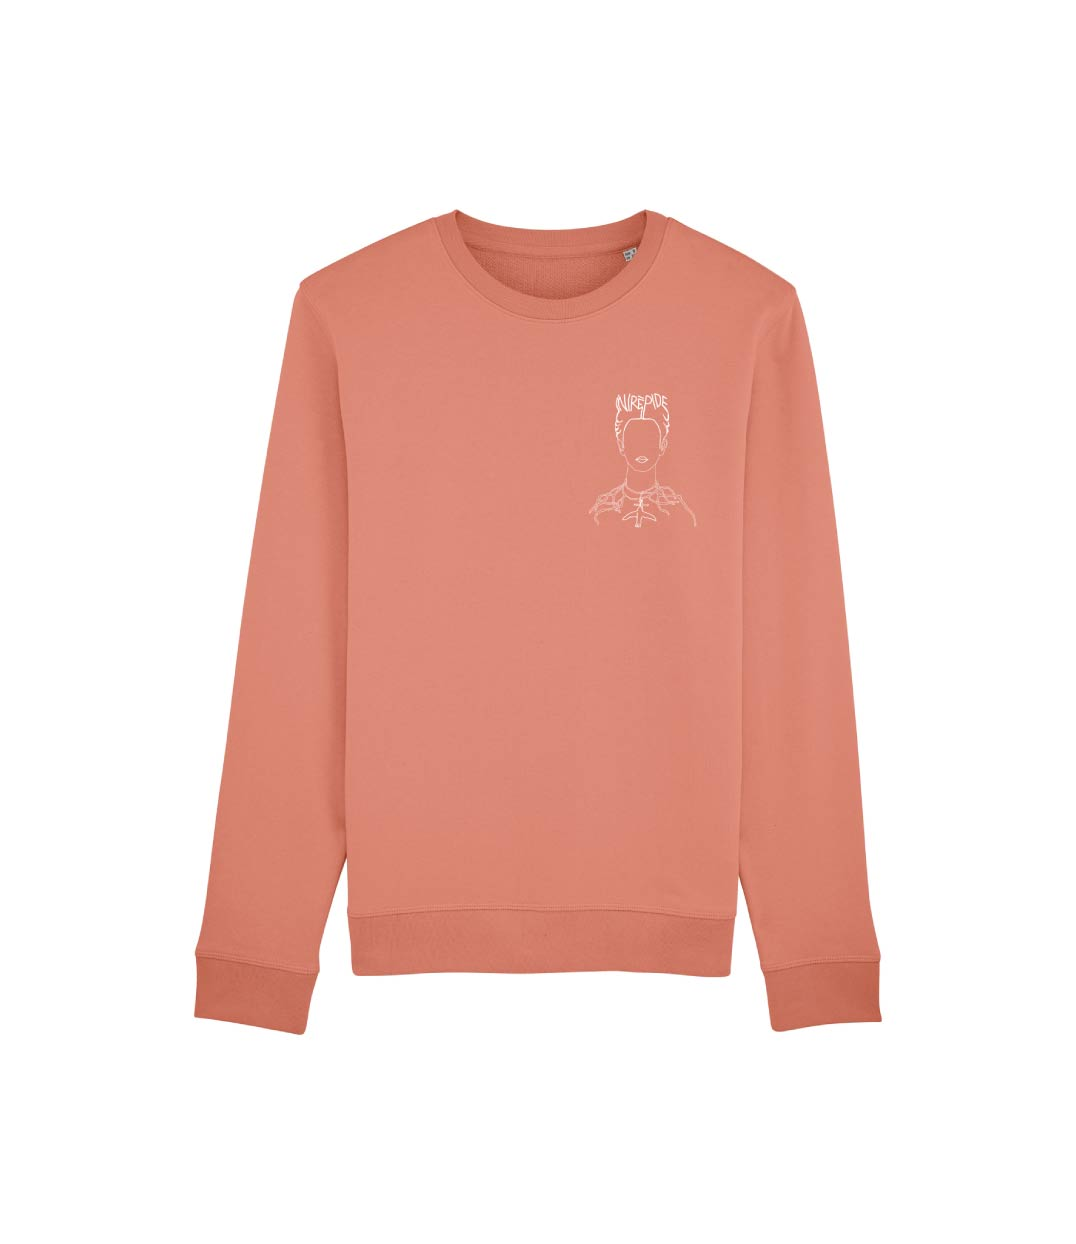 mockup sweatshirt rose pastel avec visuel frida kahlo